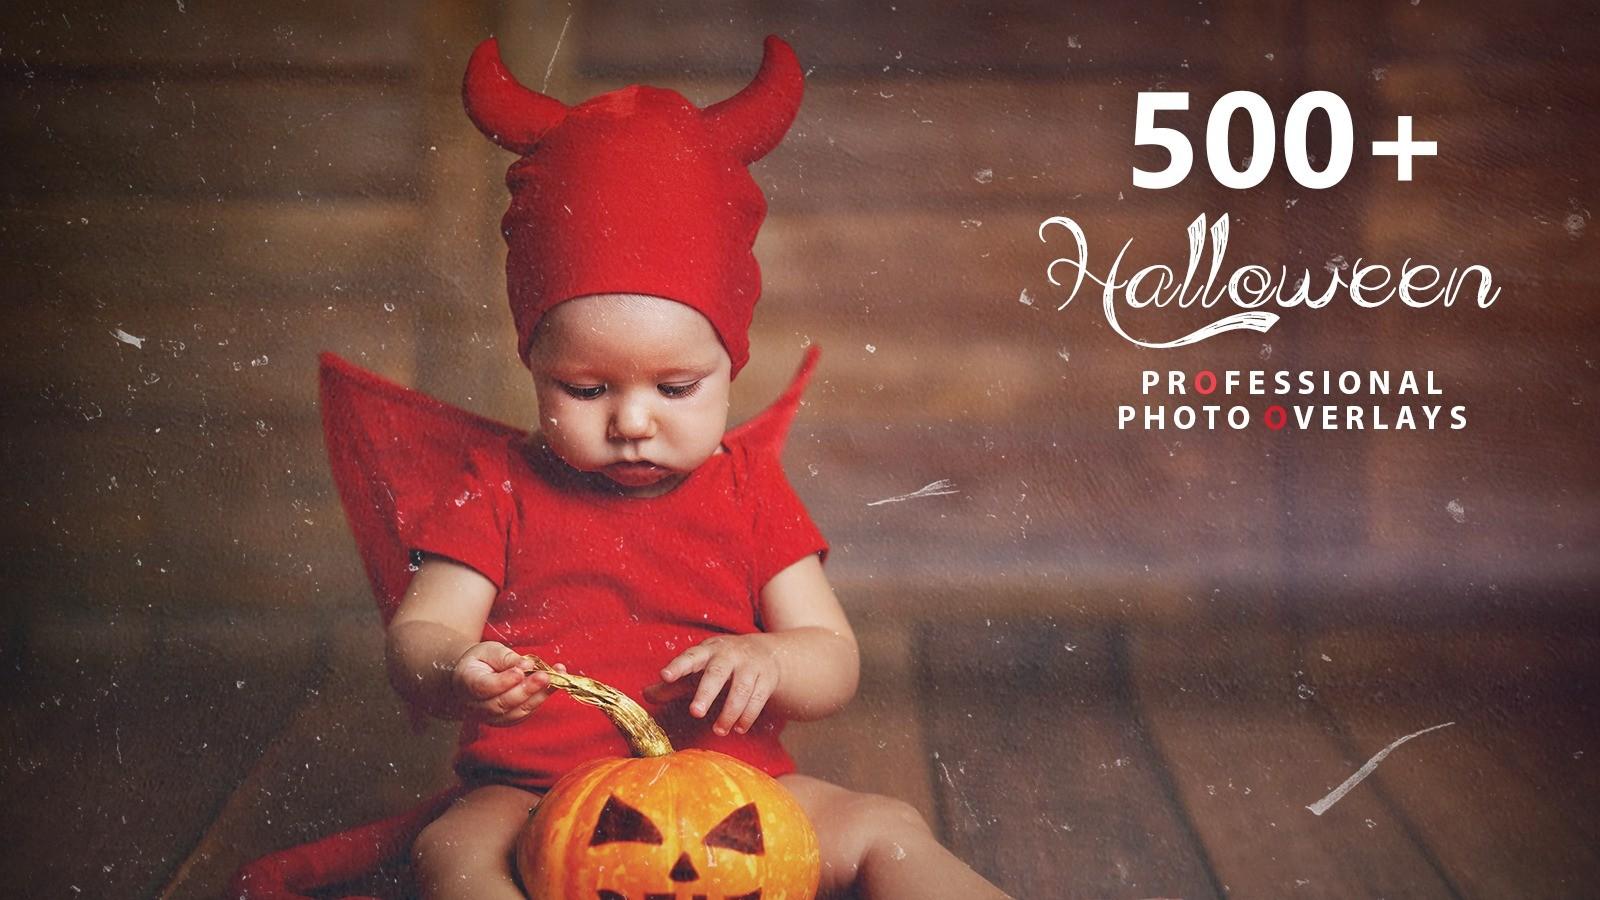 AppSumo Deal for 500+ Halloween Photo Overlays